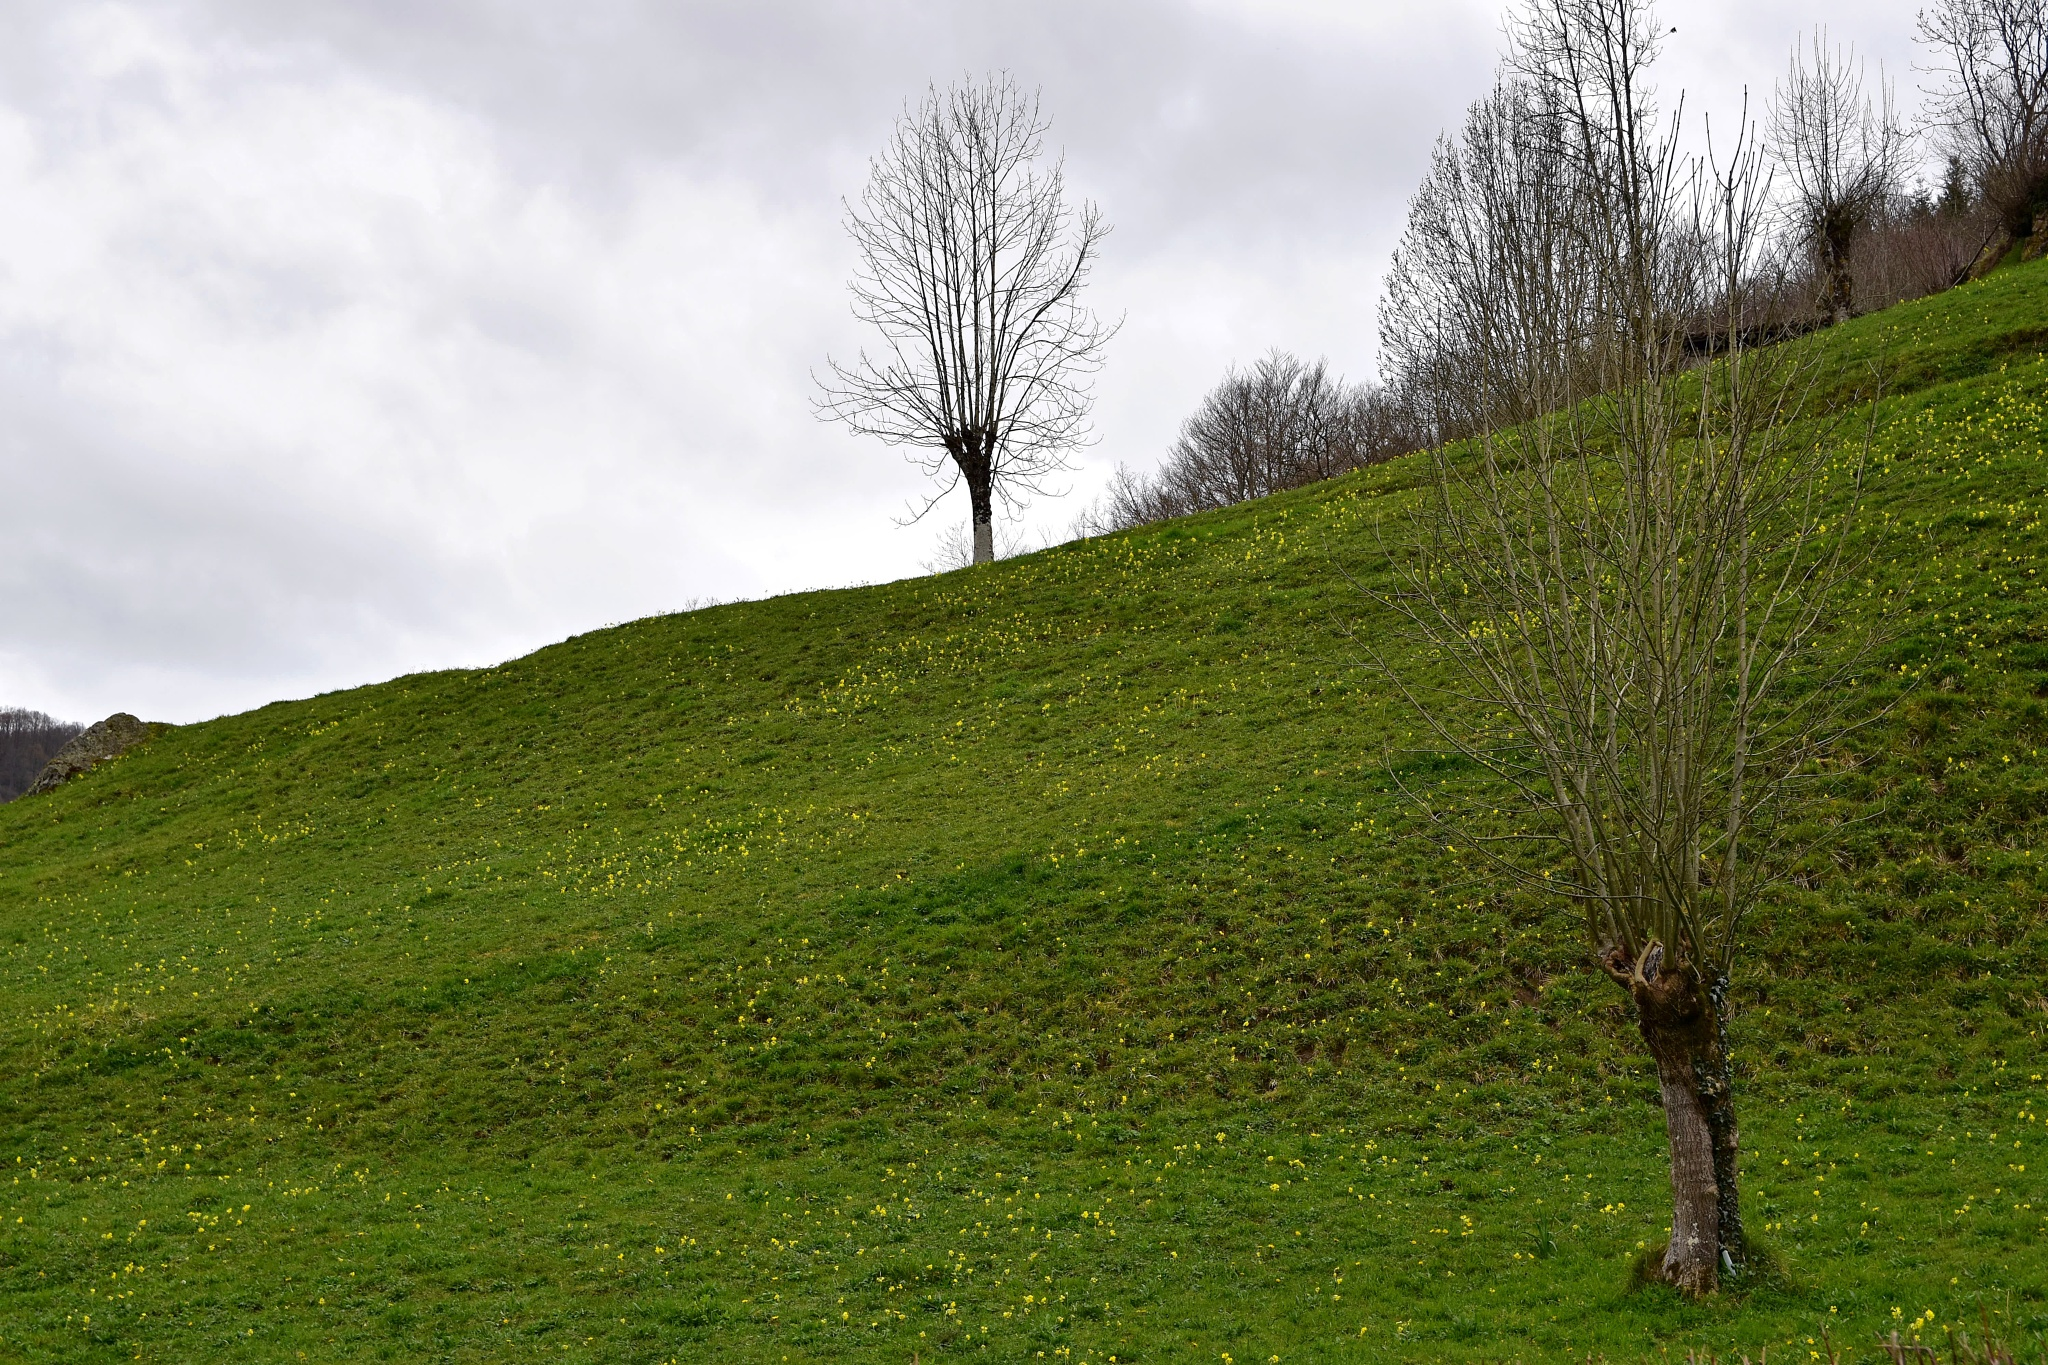 Nude trees by Xurde González Uría